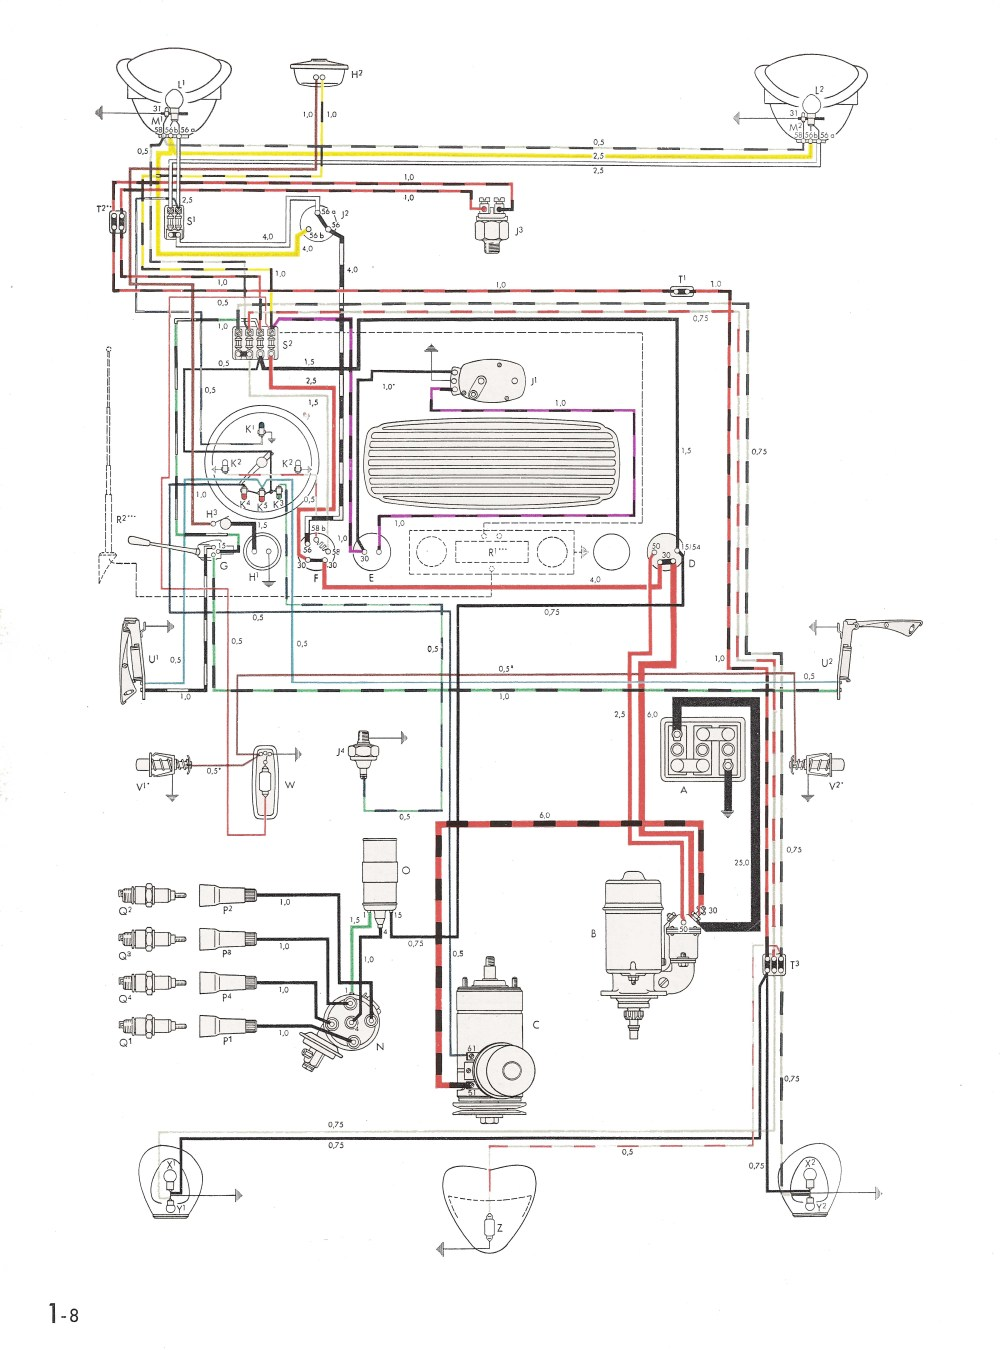 medium resolution of thesamba com type 1 wiring diagrams70 vw bug wiring diagram 4